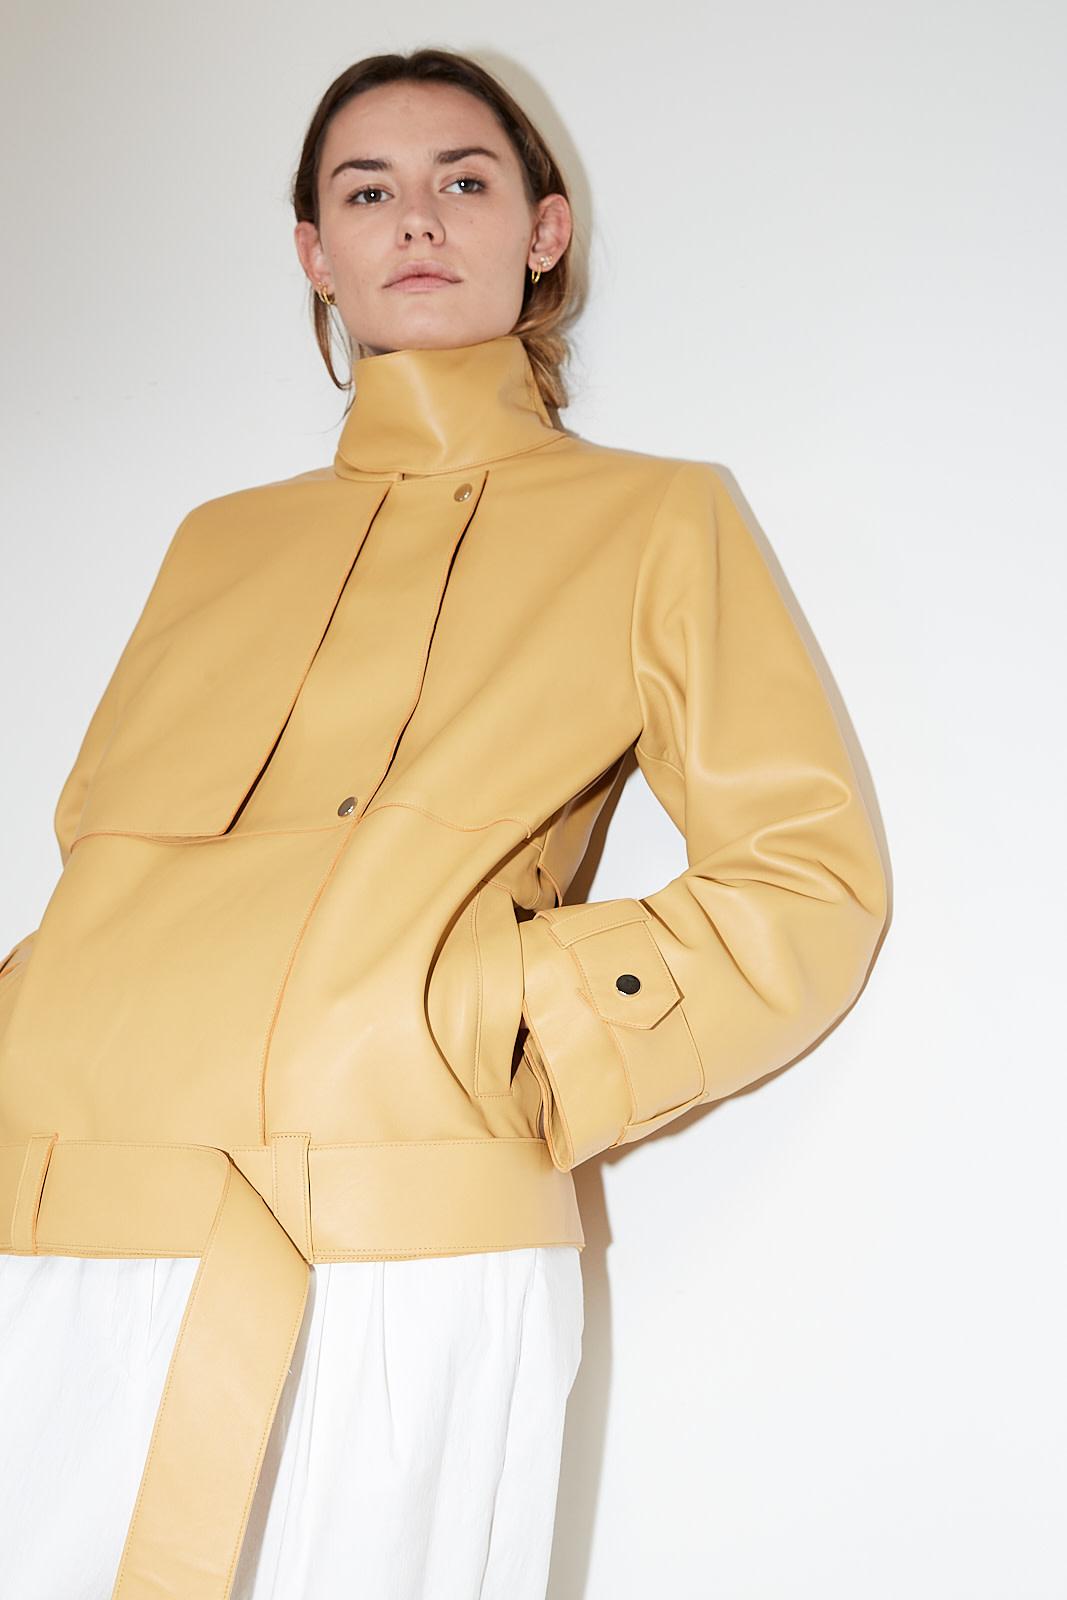 Aeron Staat leather jacket